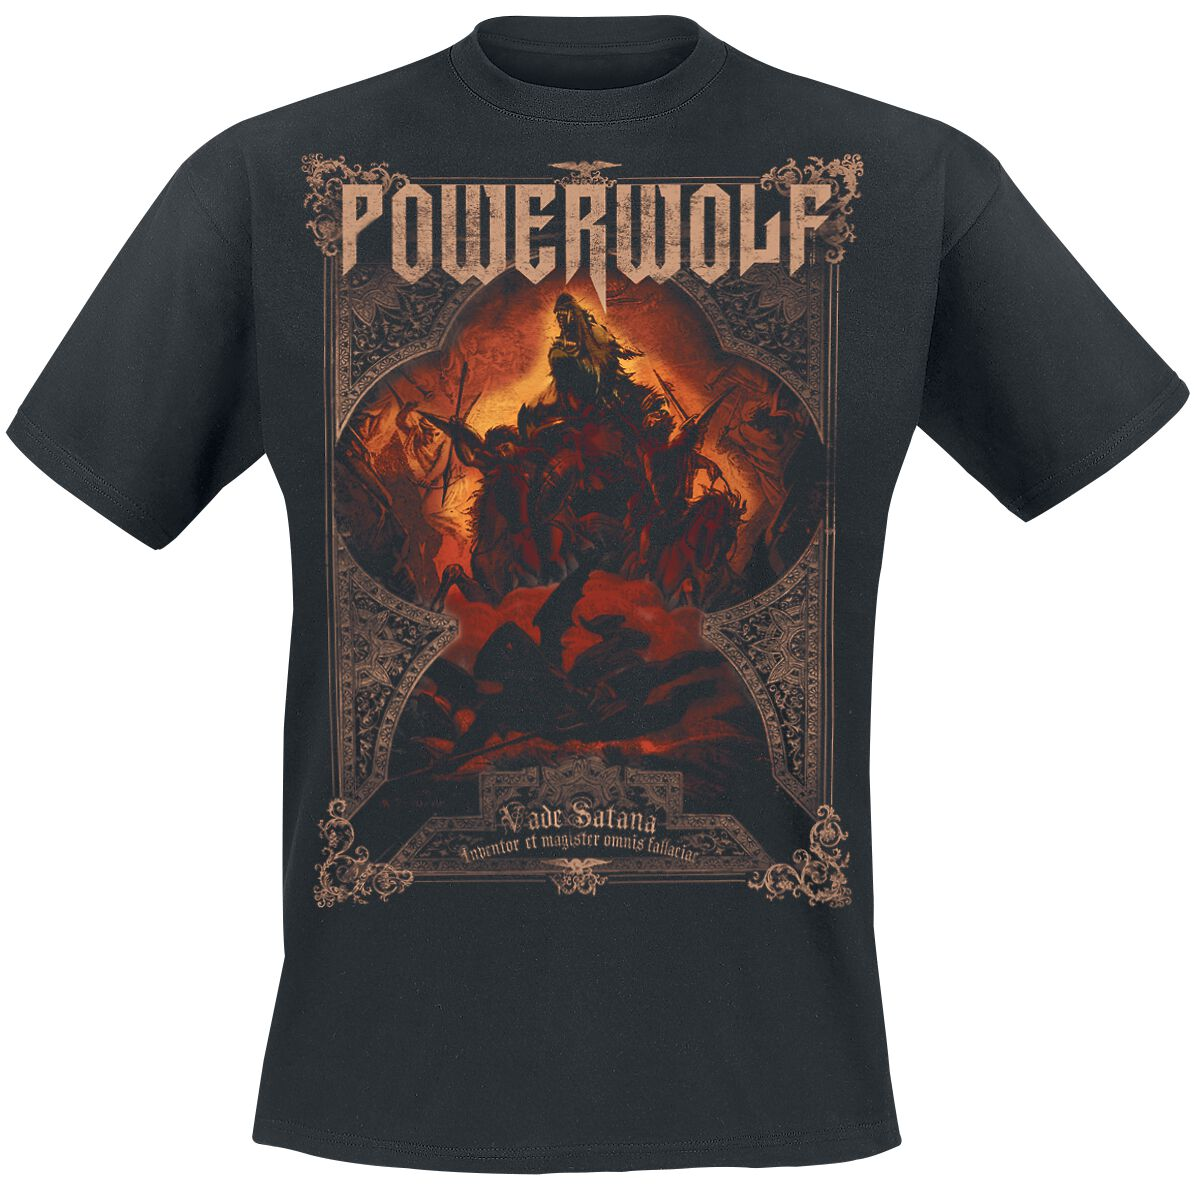 Image of   Powerwolf Vade Satana - Metal Is Religion T-Shirt sort